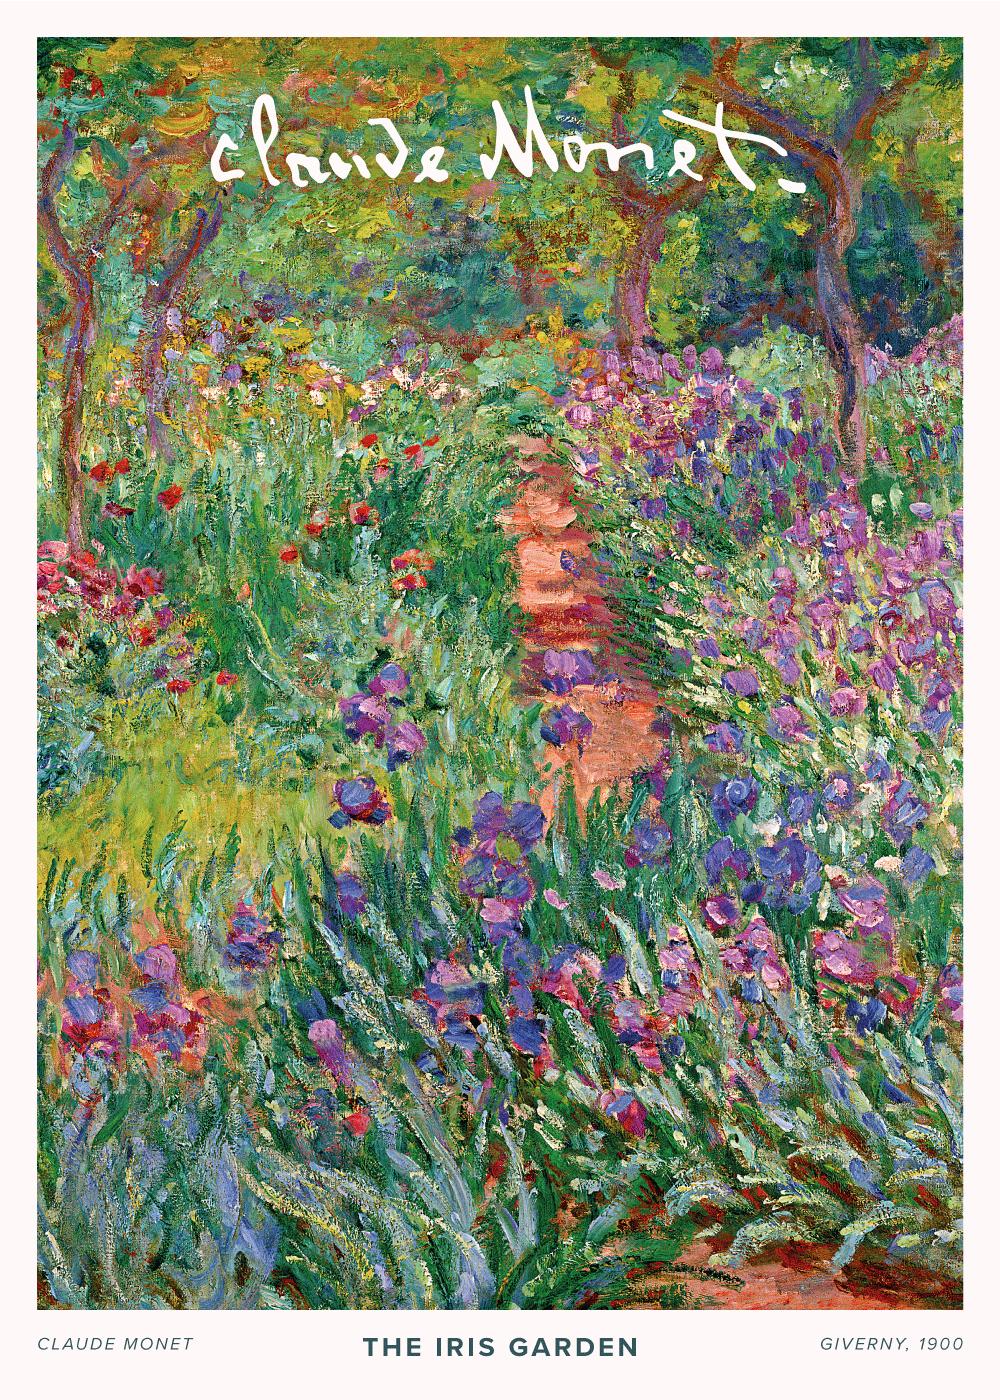 Billede af The iris garden - Claude Monet